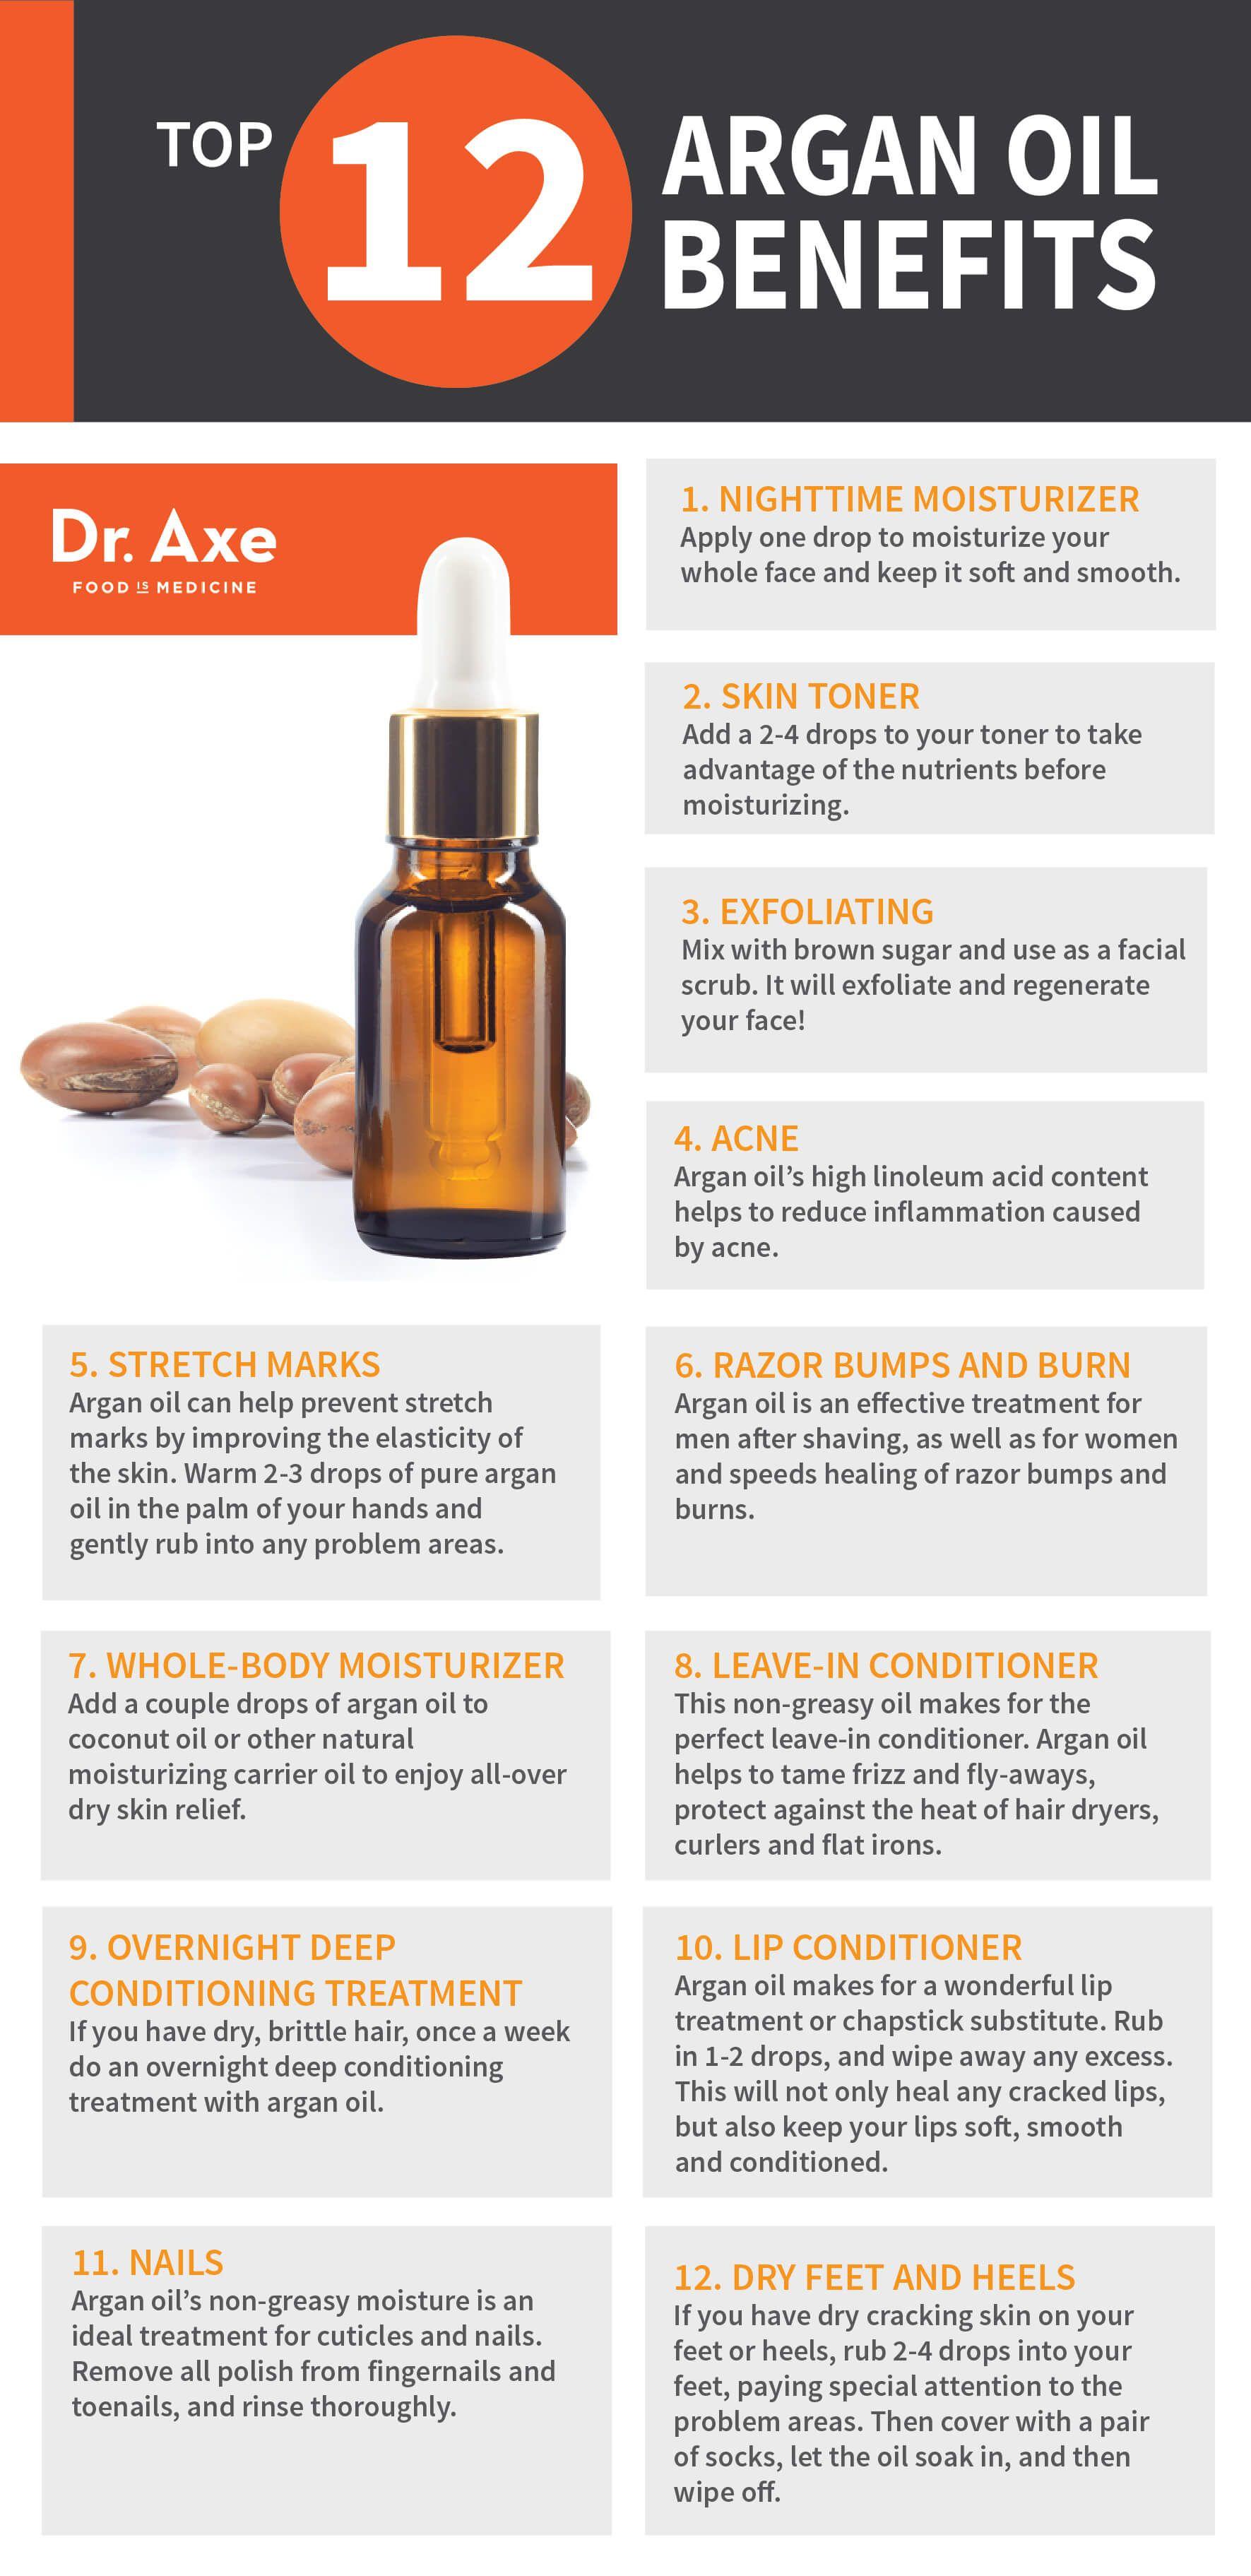 12 Ways To Use Argan Oil Argan Oil Benefits Argan Oil Skin Benefits Anti Aging Skin Products